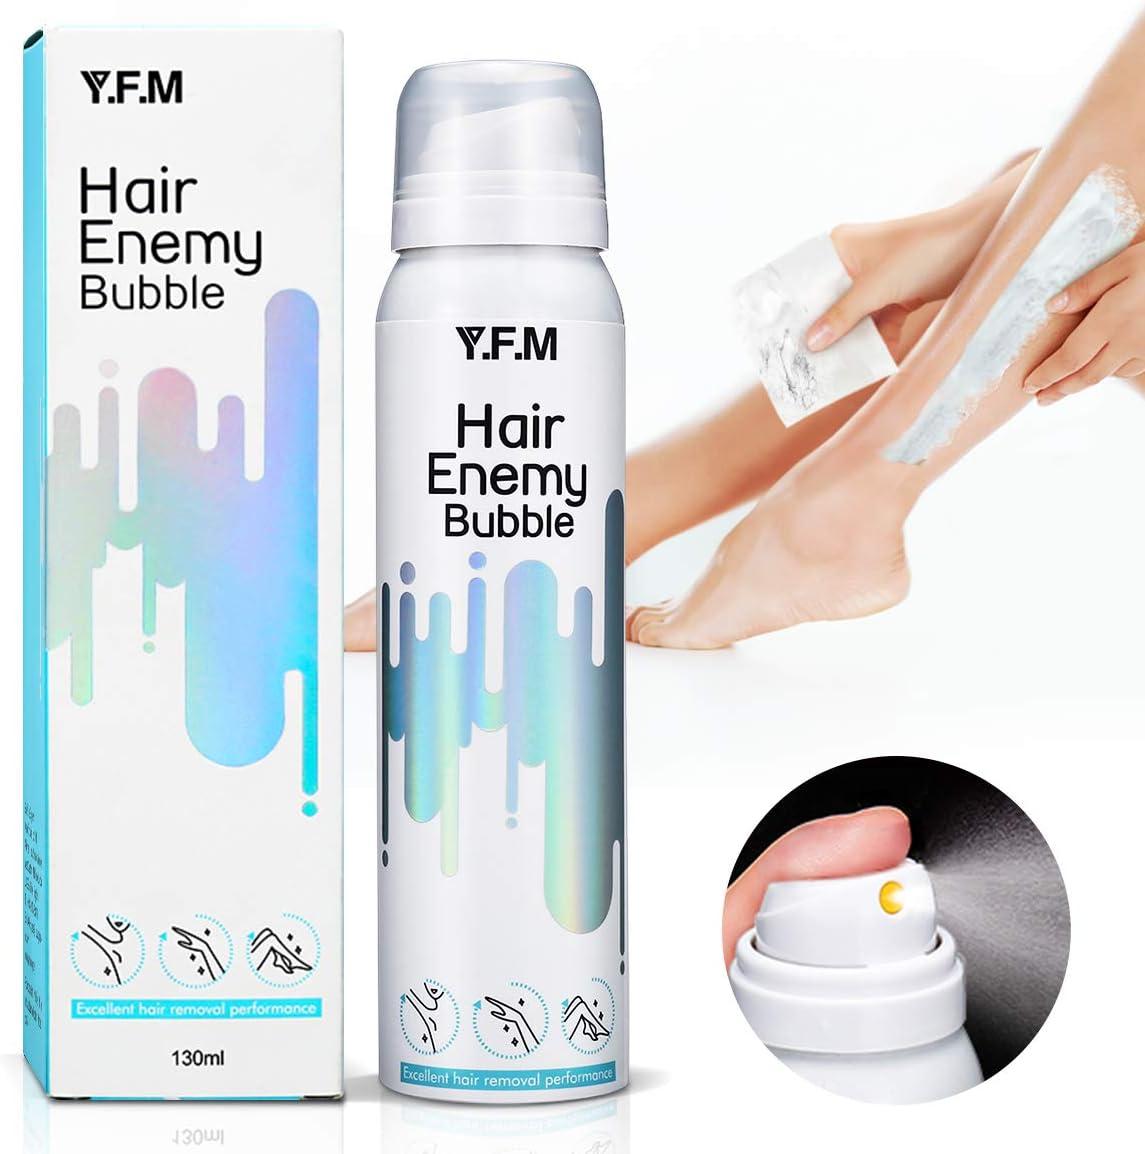 Y.F.M Spray Depilatoria, Espuma Depilatoria Hidratante, Crema ...